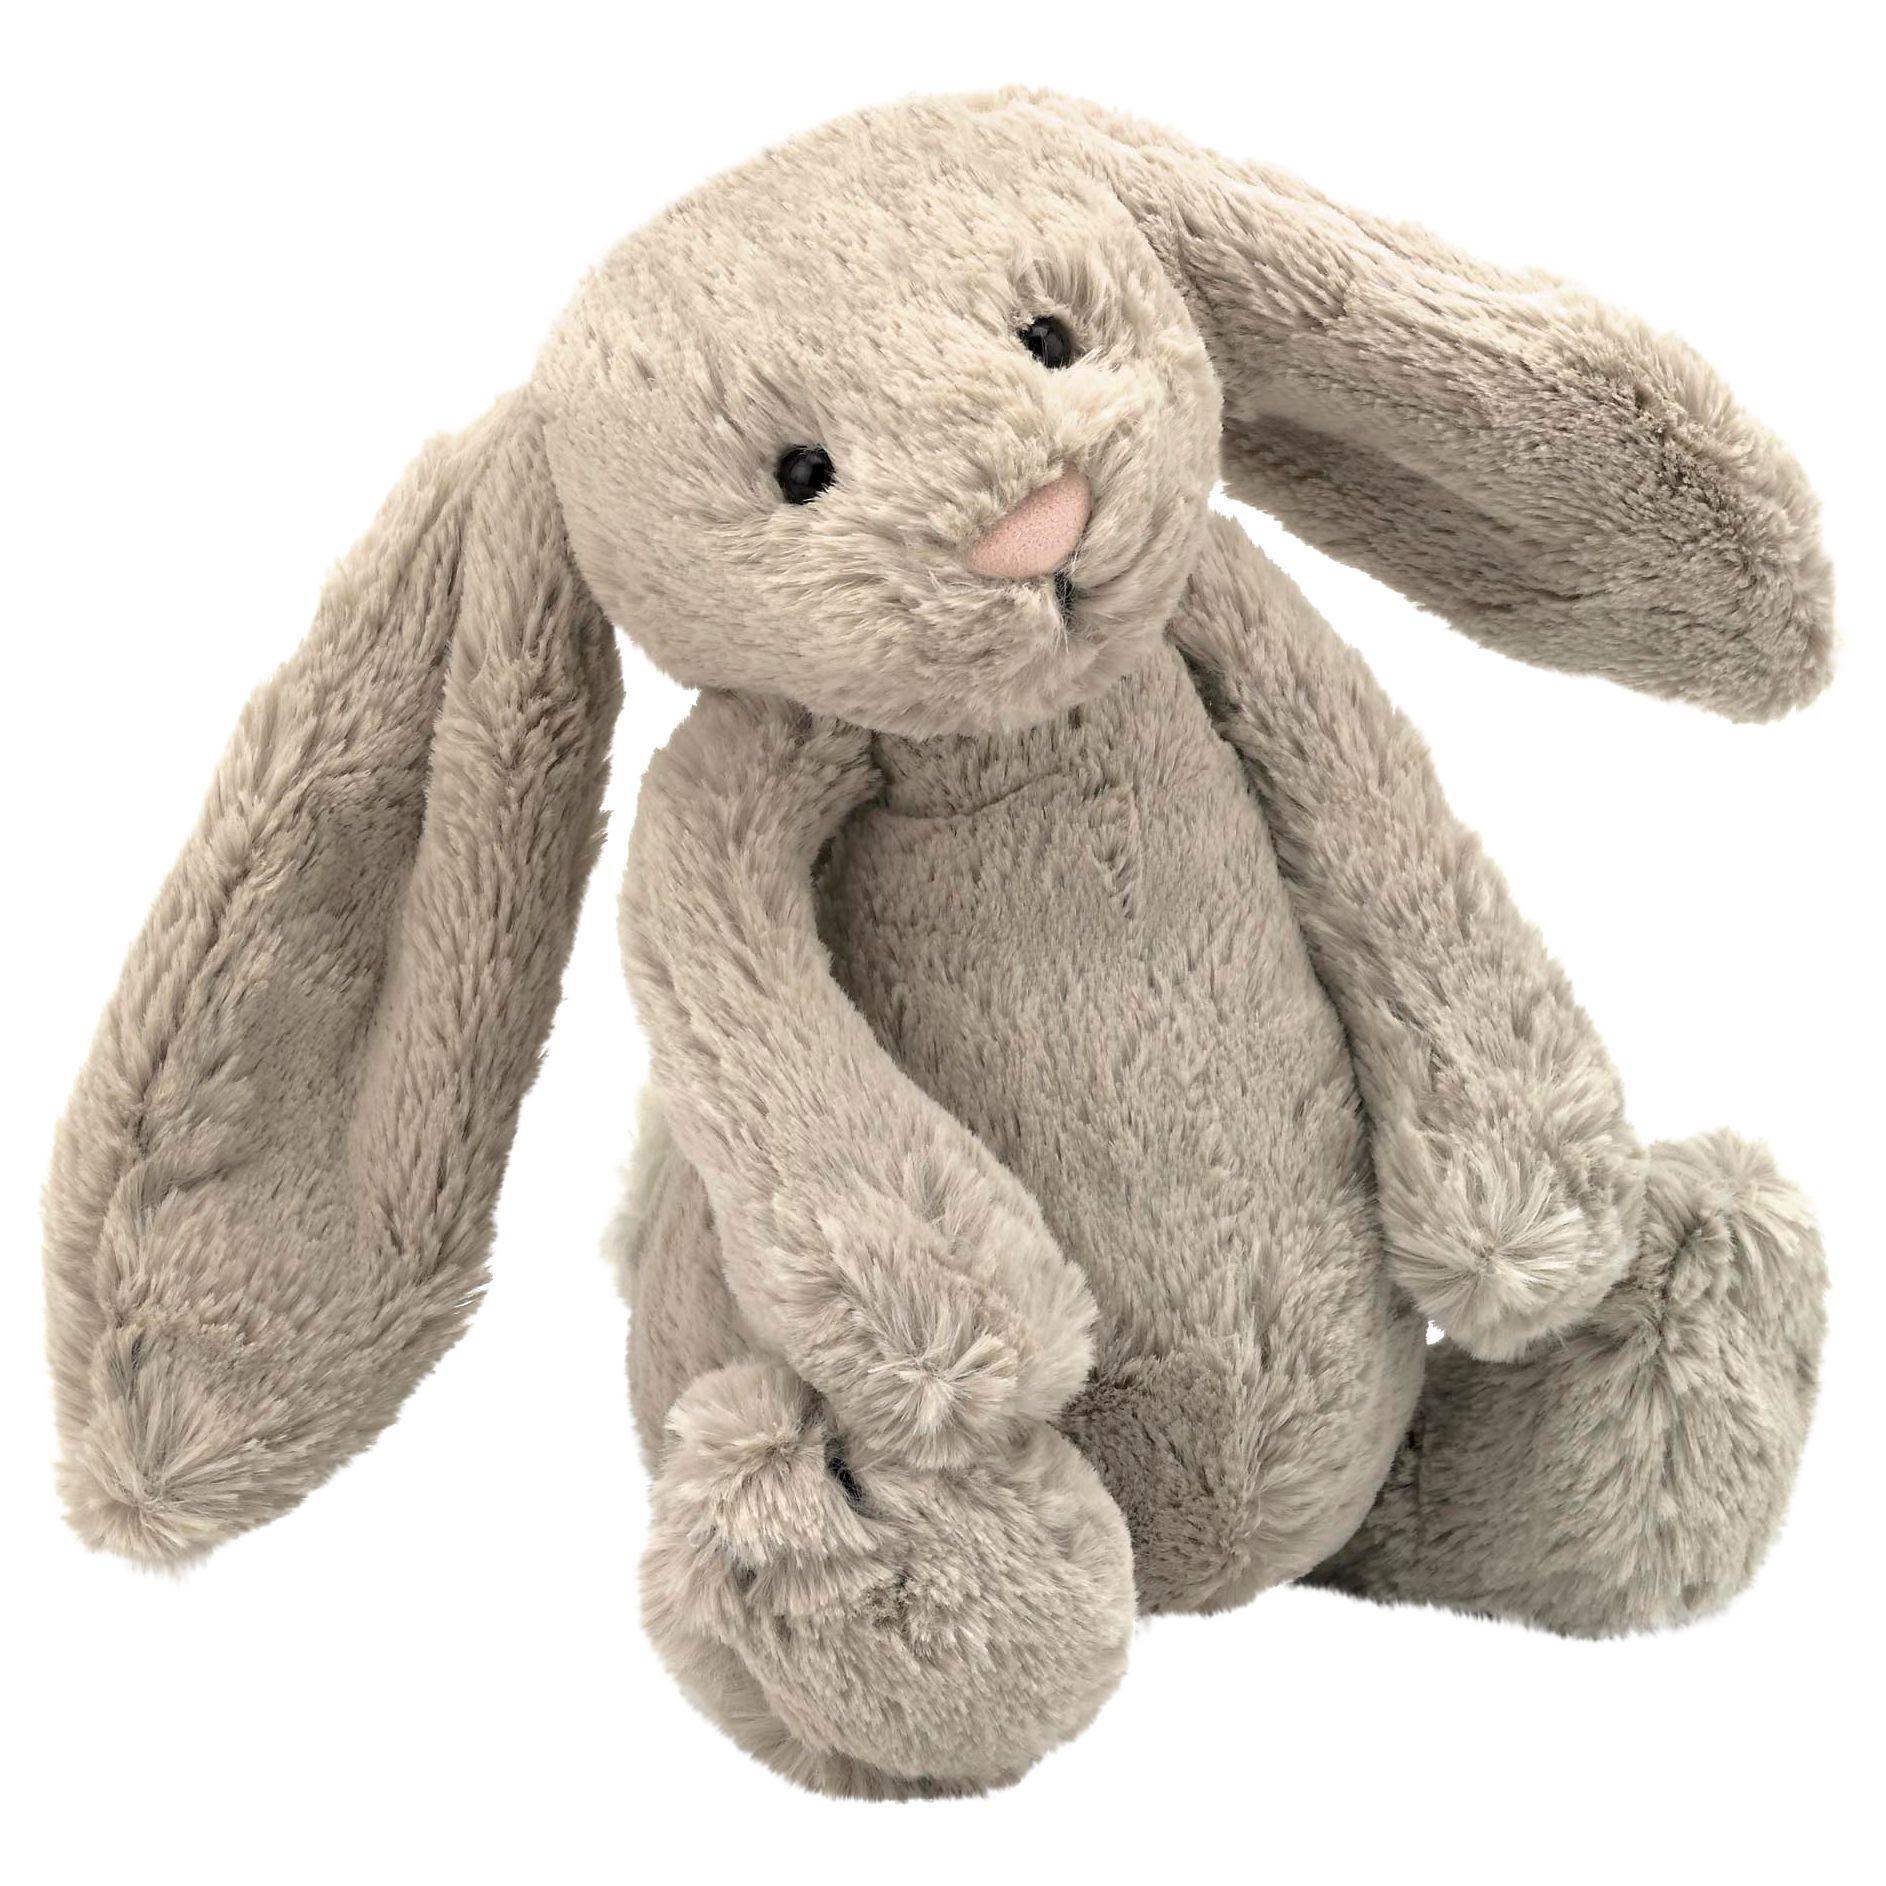 Jellycat Bashful Bunny Toy, Beige, Medium